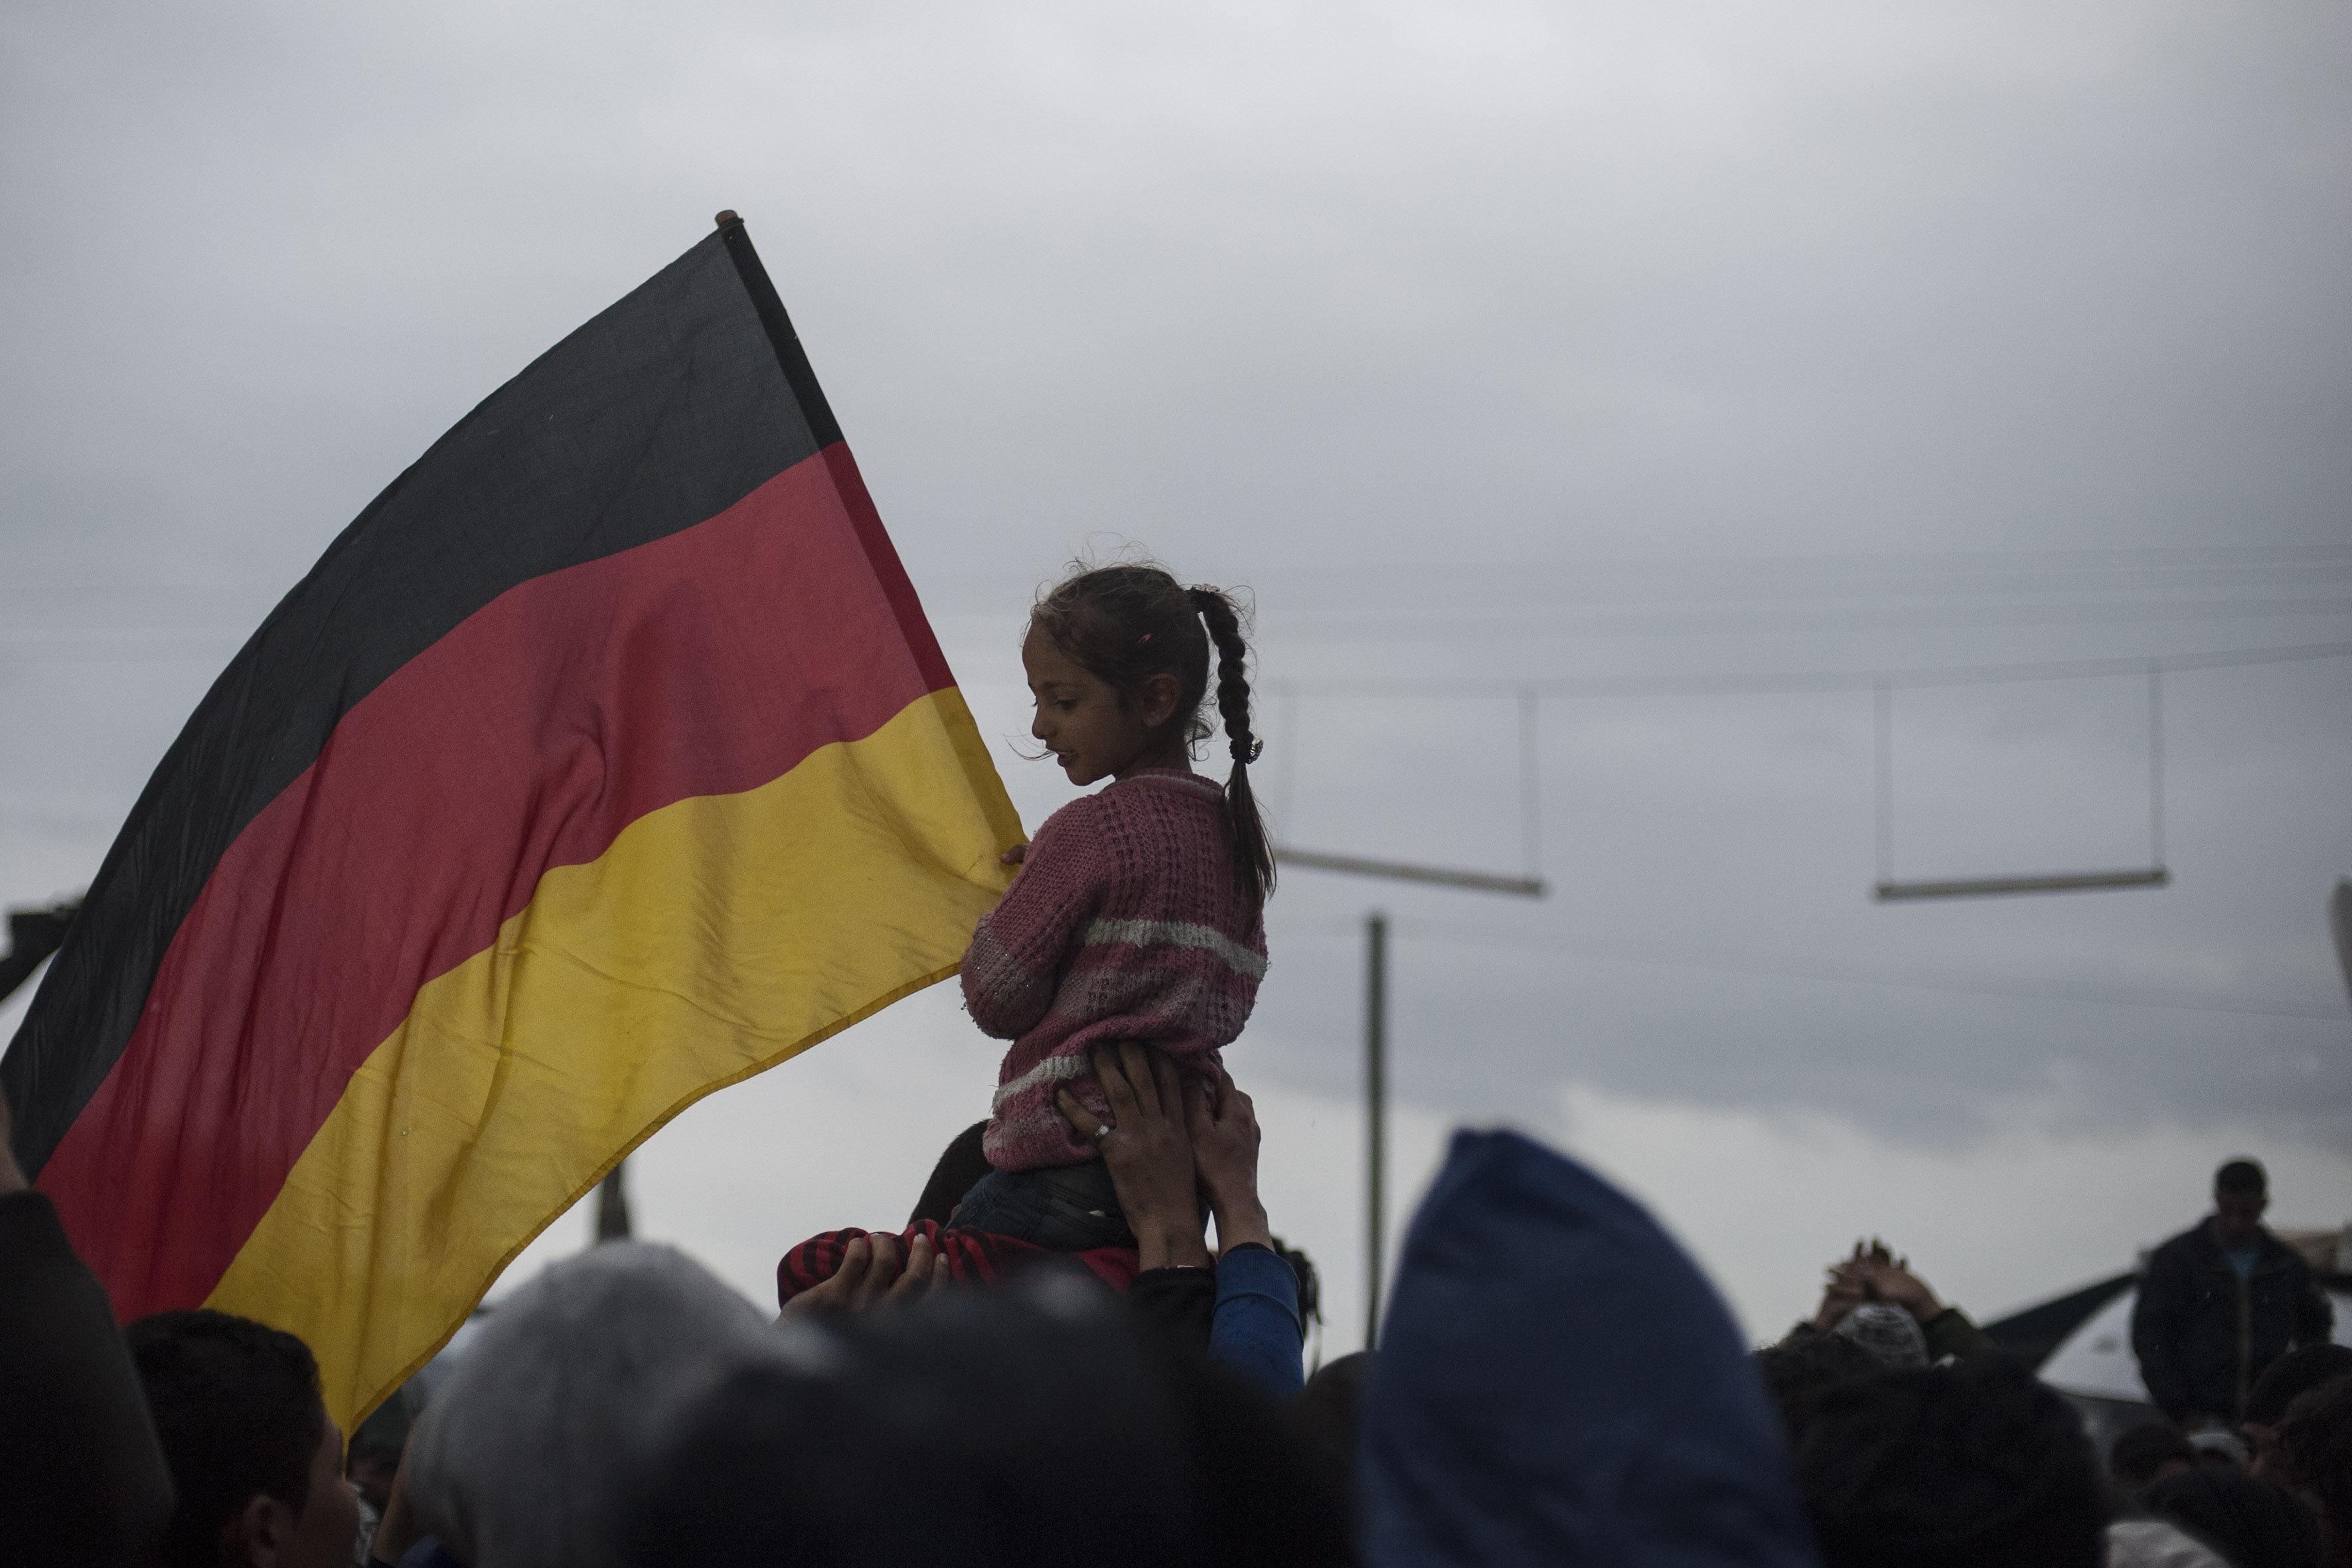 A child raises a German flag at a refugee camp.